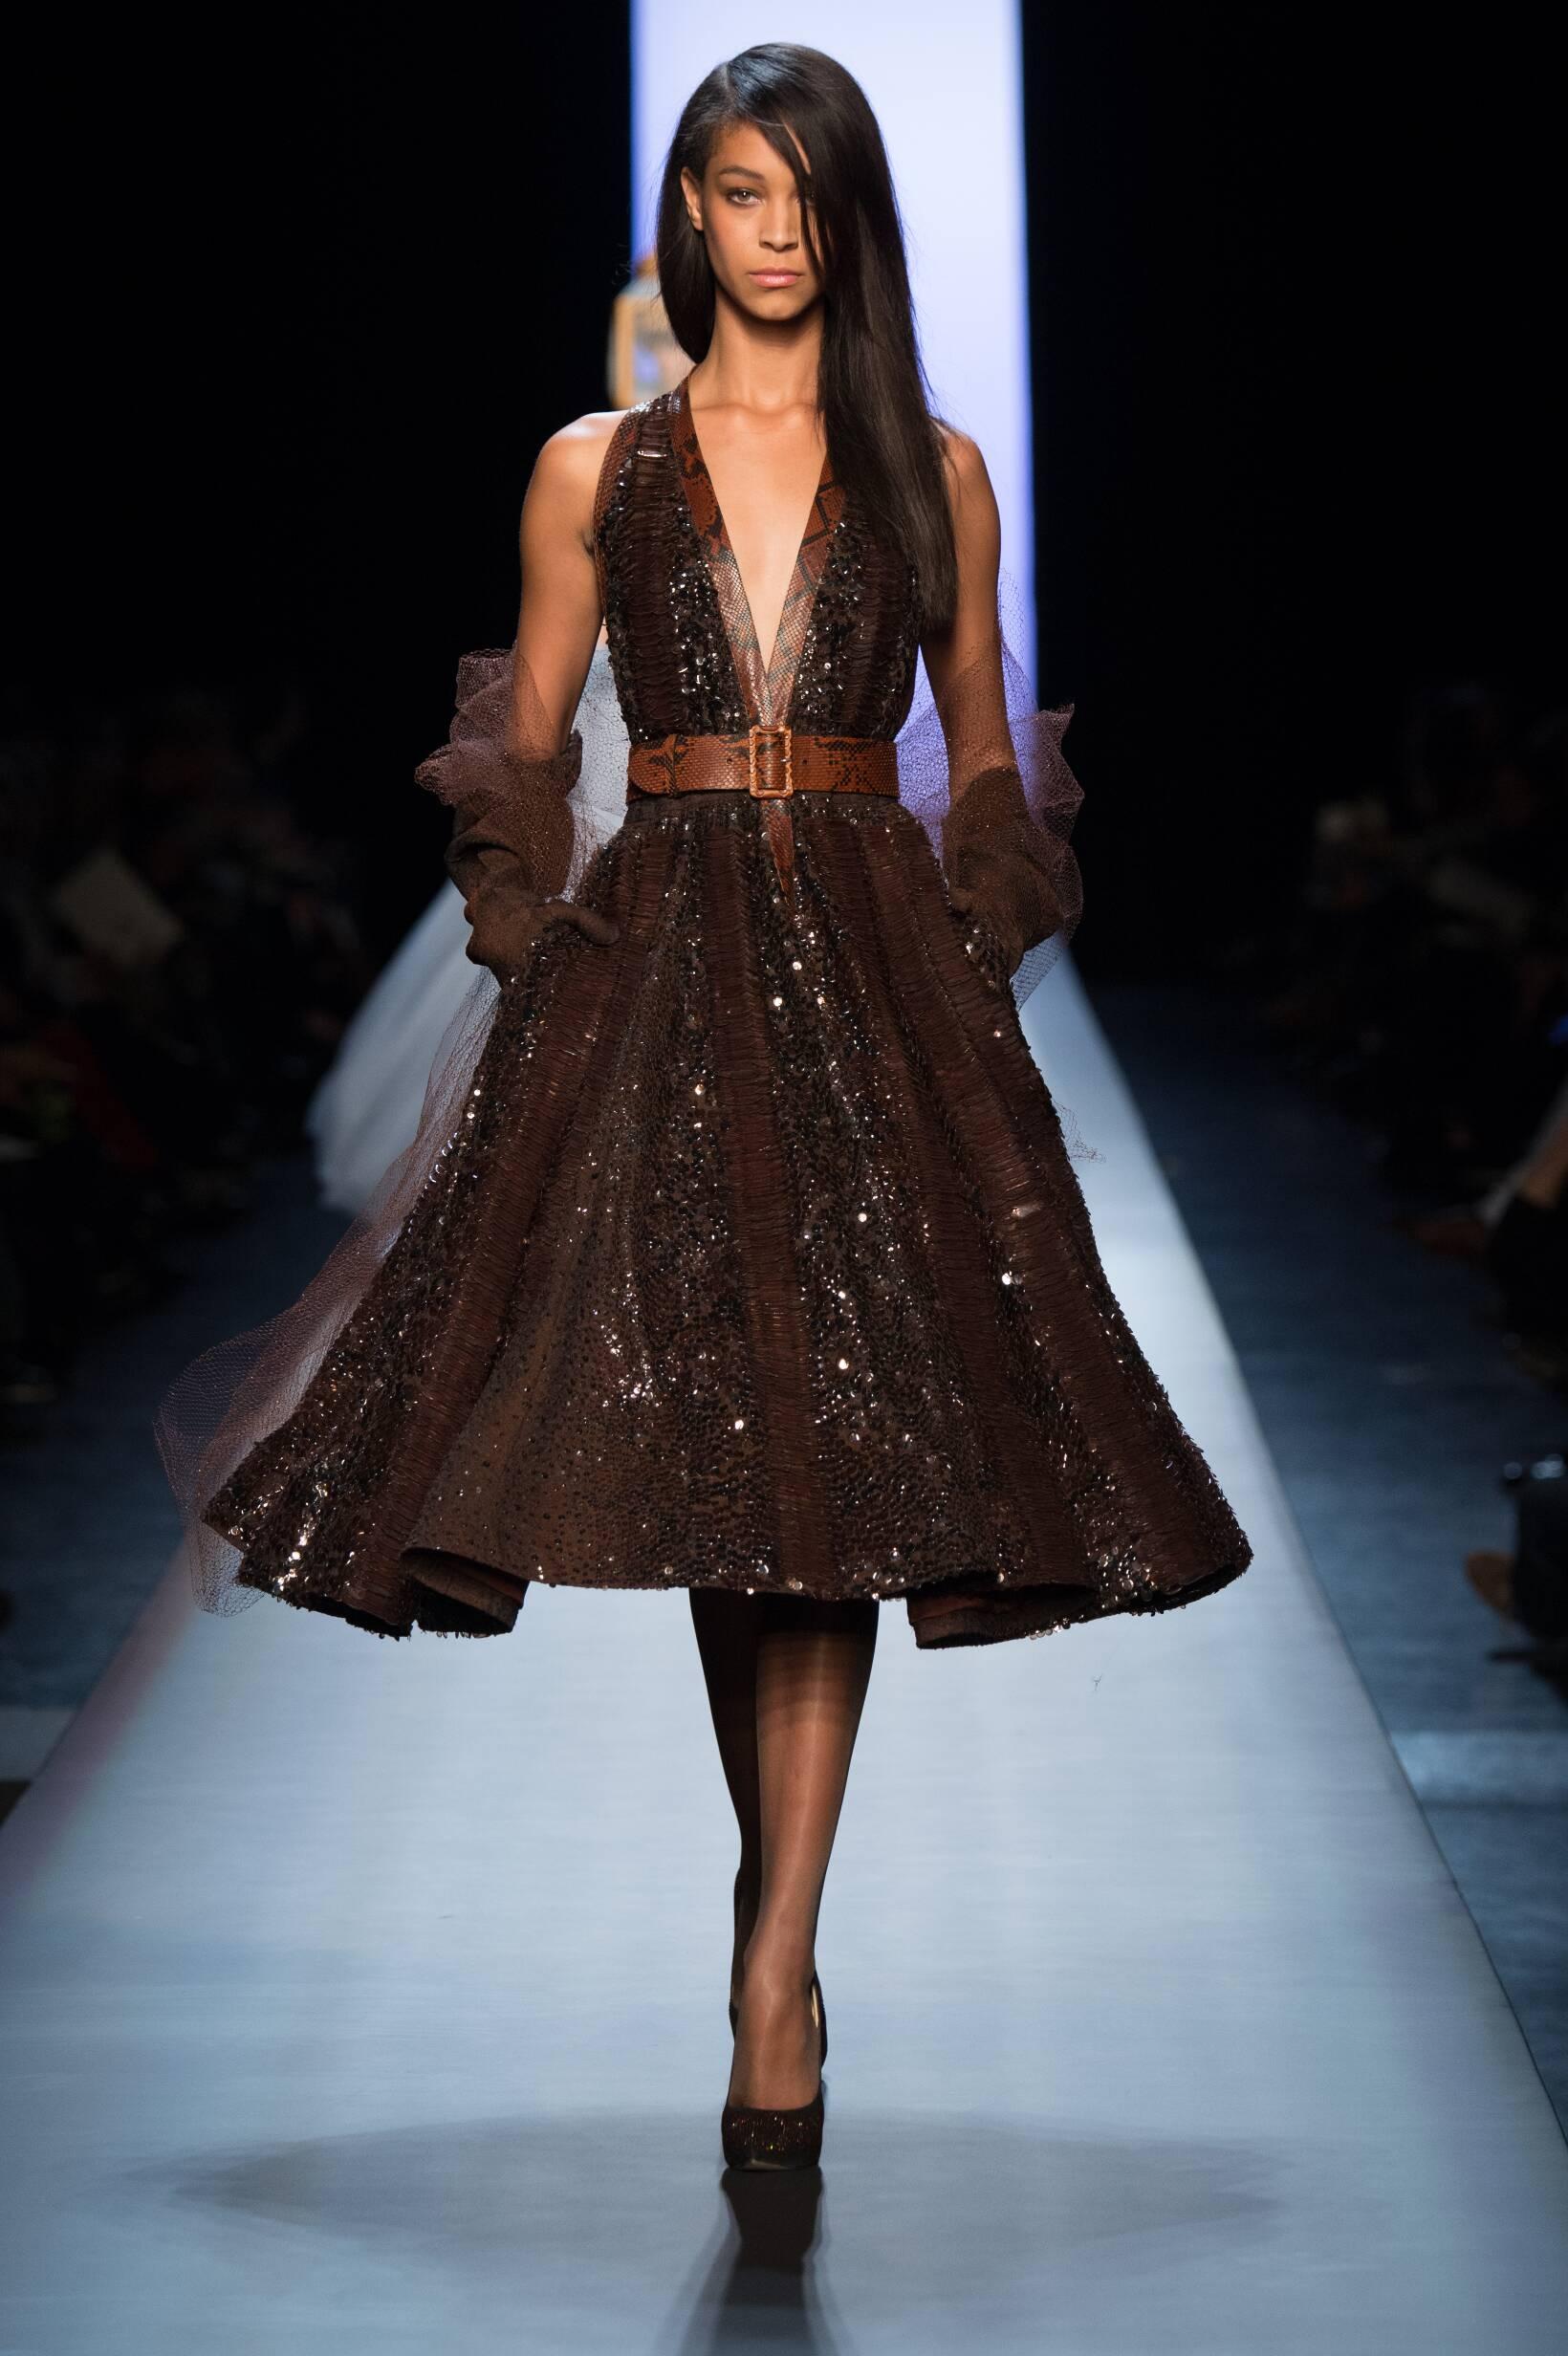 Jean Paul Gaultier Haute Couture Collection Summer 2015 Catwalk